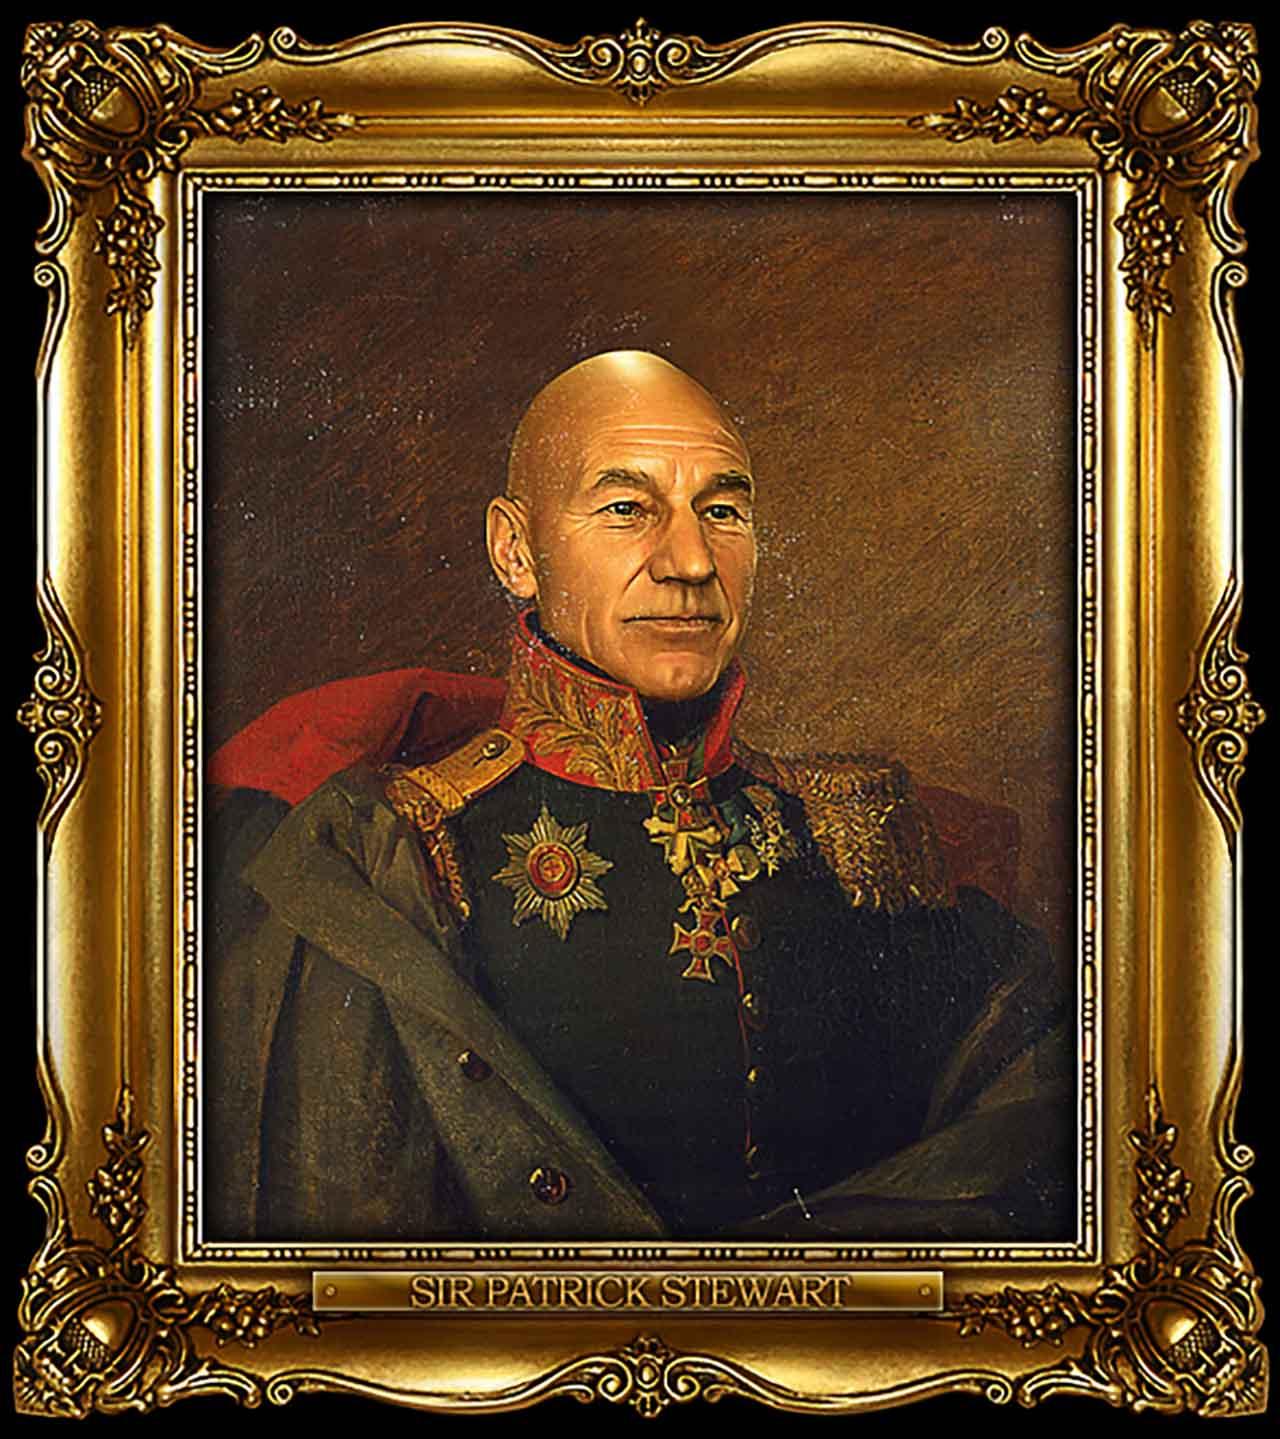 Artist Turns Famous Actors Into Russian Generals - Sir Patrick Stewart